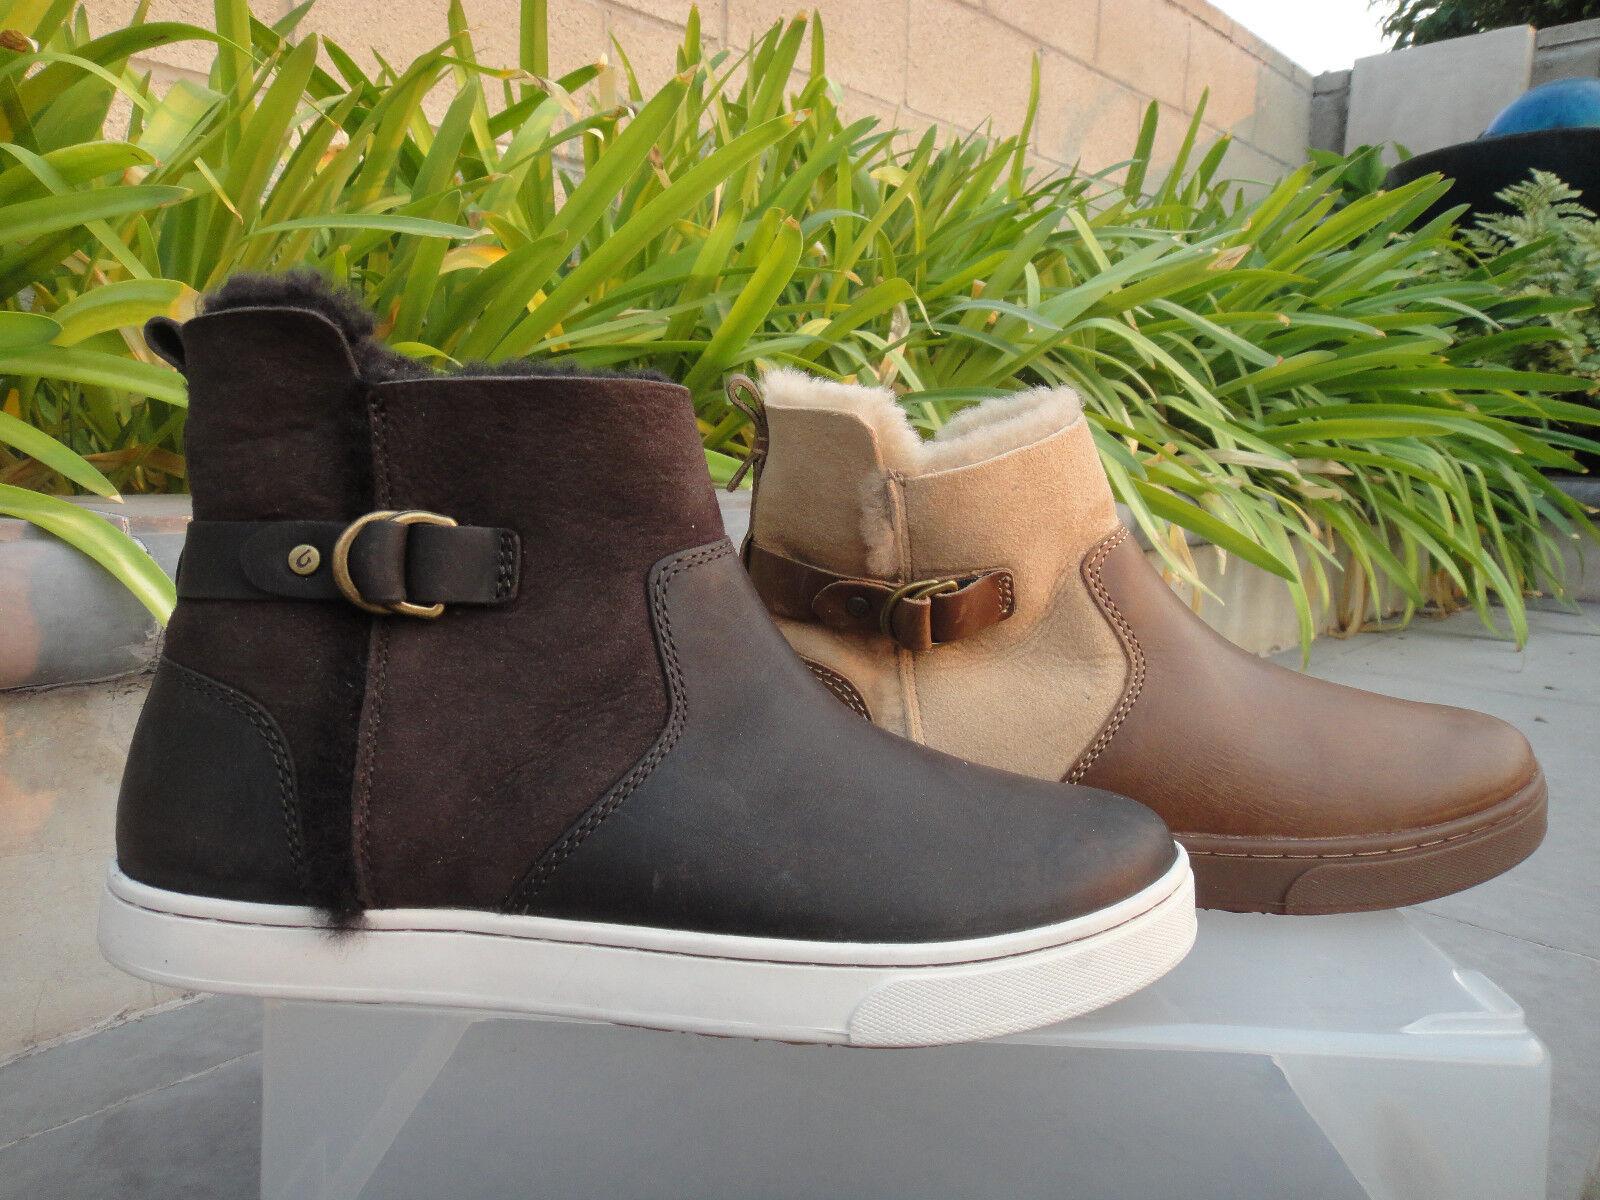 OluKai PEHUEA HULU  Genuine Shearling scarpe da ginnastica avvio, oroen Sand o Dark Java, 7M  risparmiare sulla liquidazione